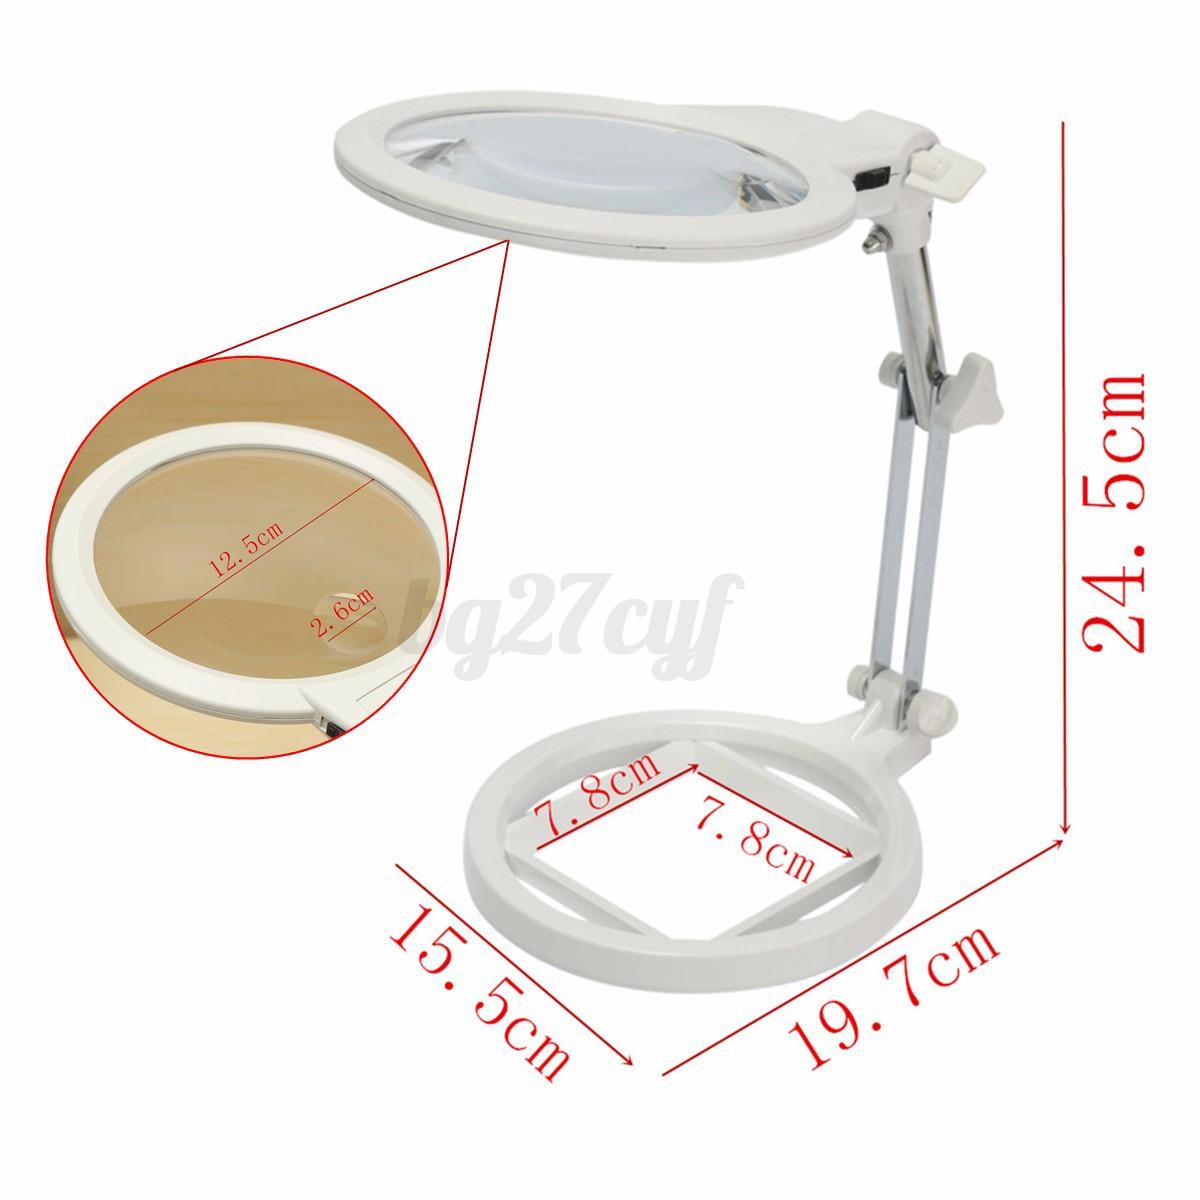 Desk magnifying craft lamp glass adjustable 2 6x magnifier for Craft light with magnifying glass